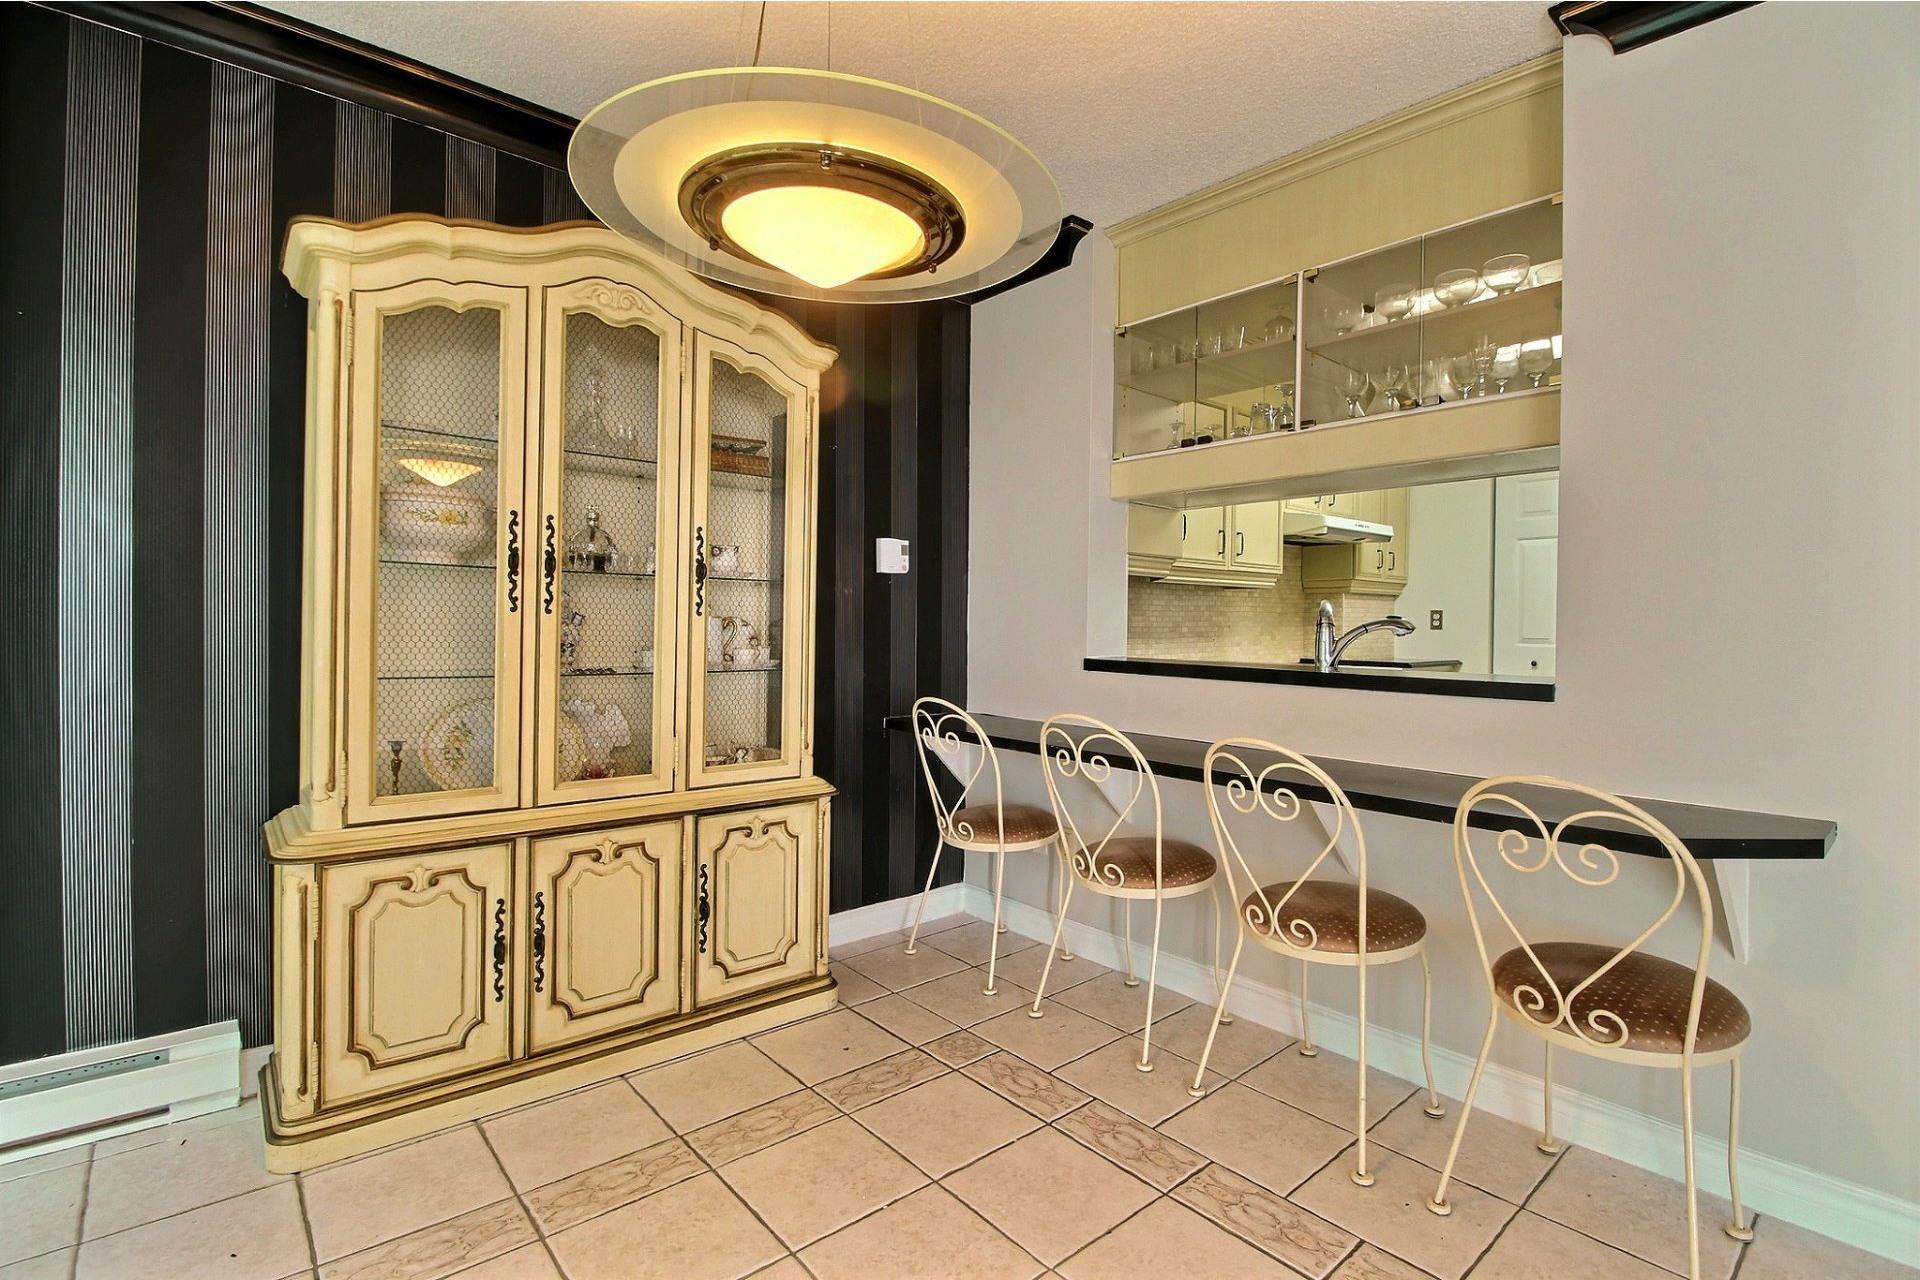 image 8 - Appartement À vendre Repentigny Repentigny  - 7 pièces